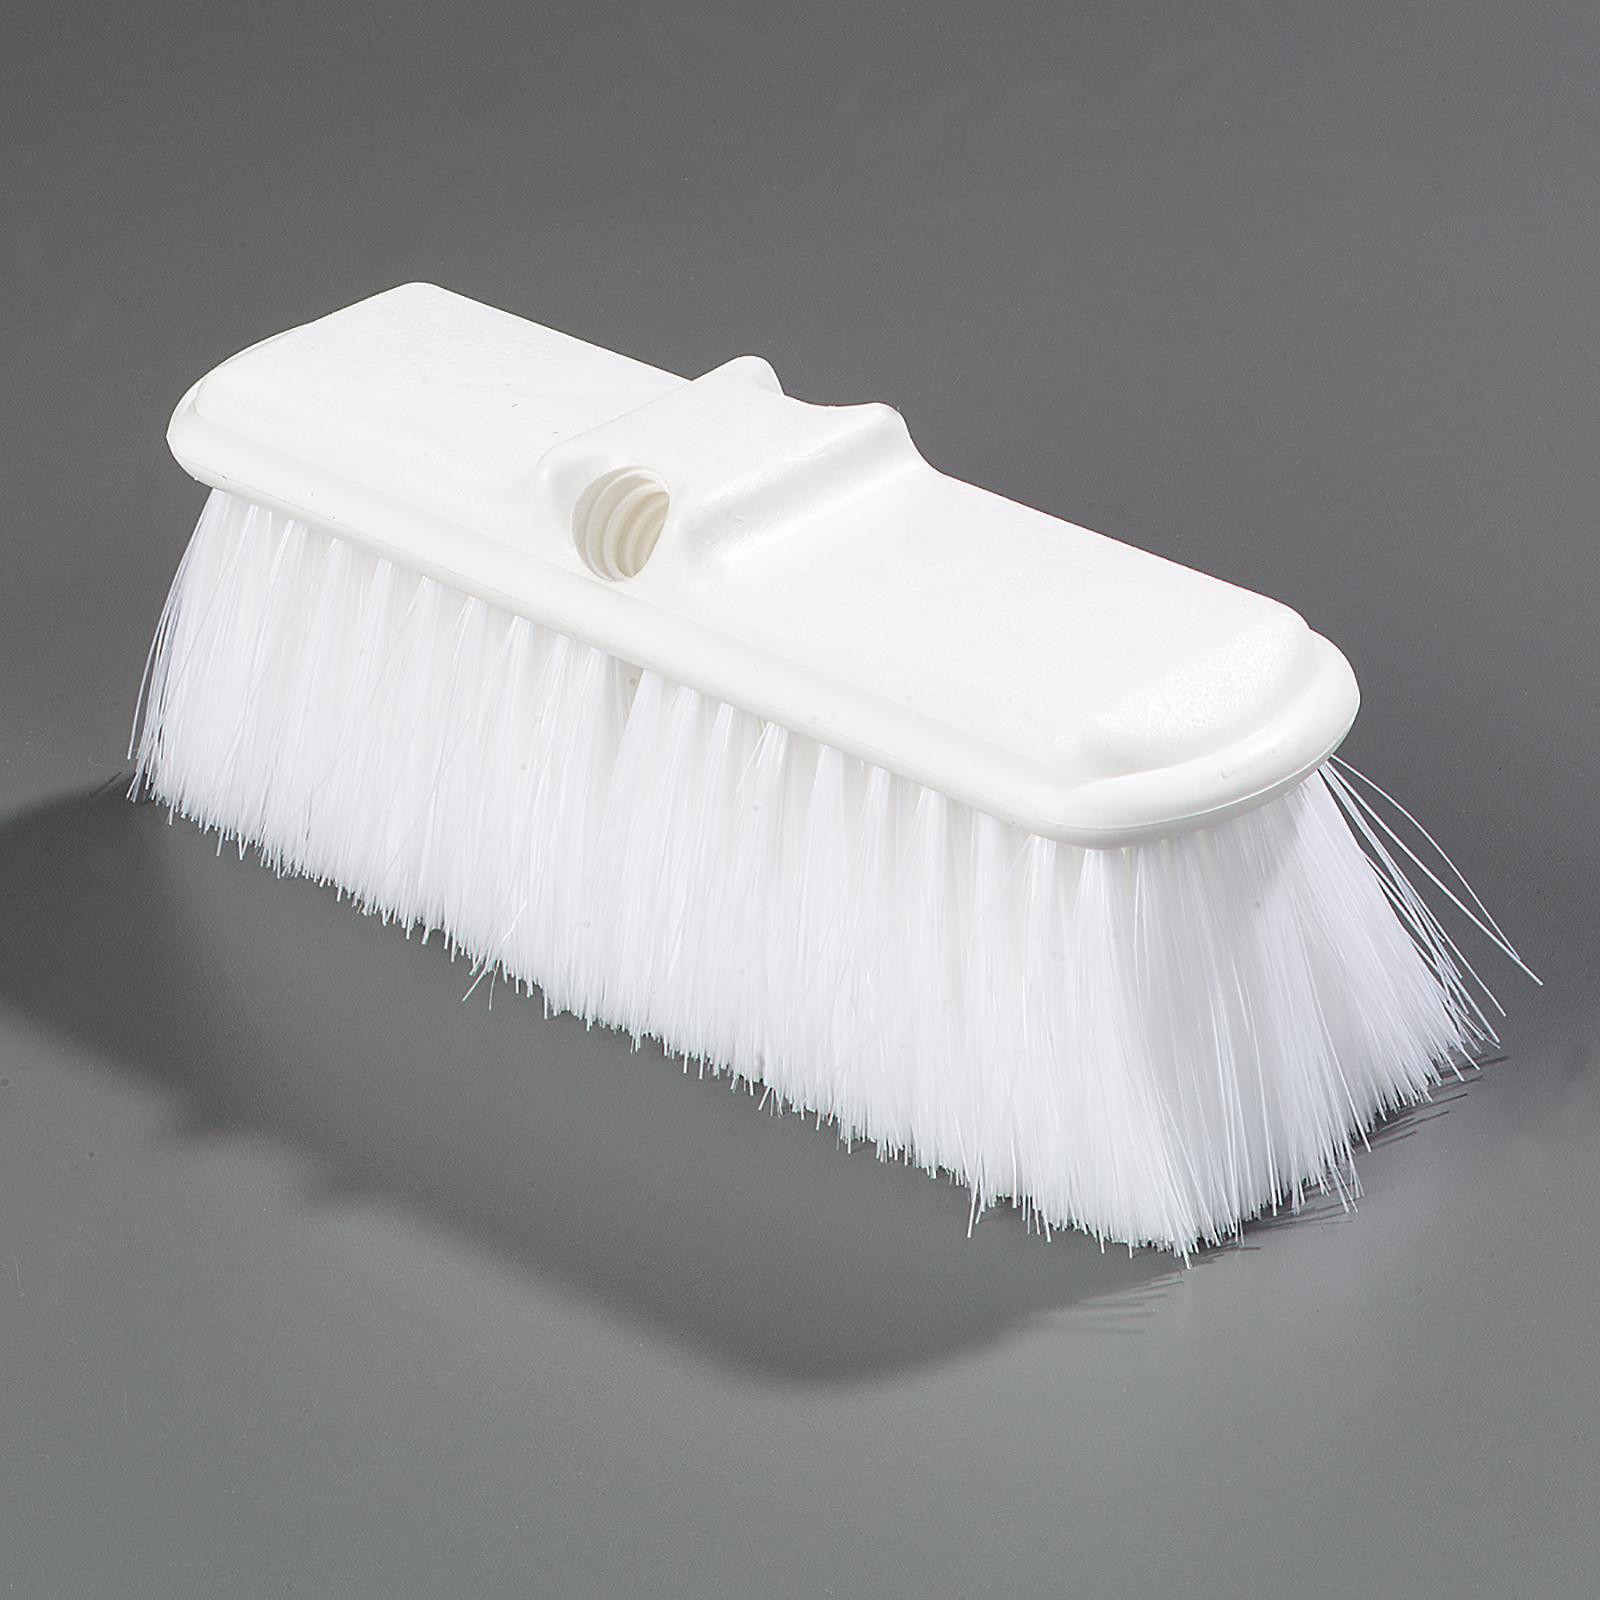 Carlisle 4005004 brush, misc